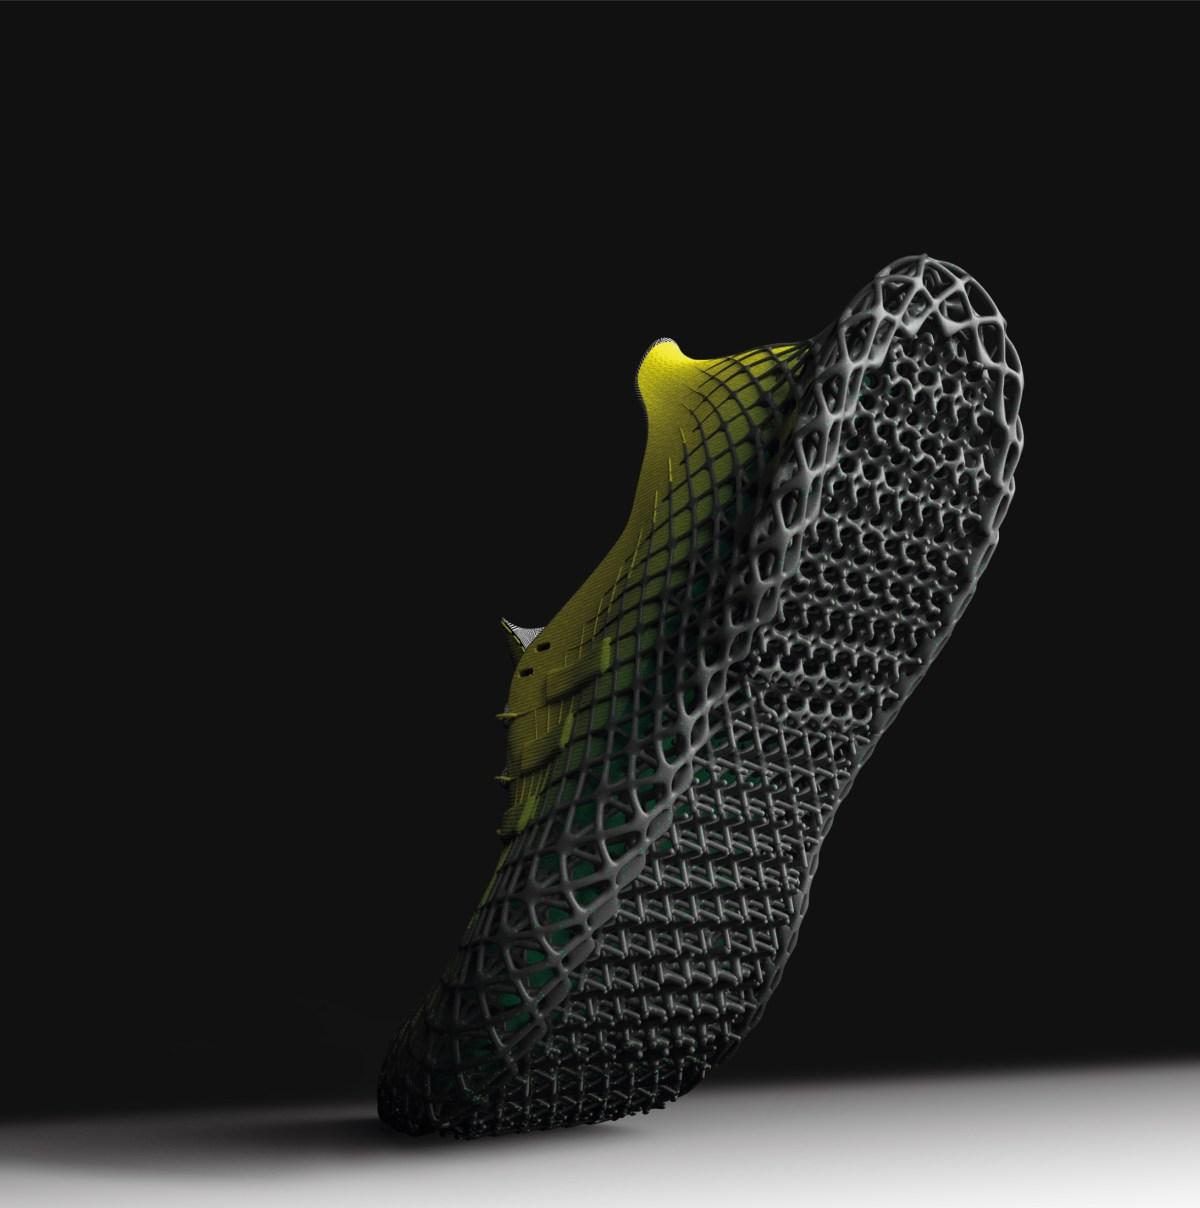 grit-training-shoes-aarish-netarwala-design_dezeen_2364_col_3